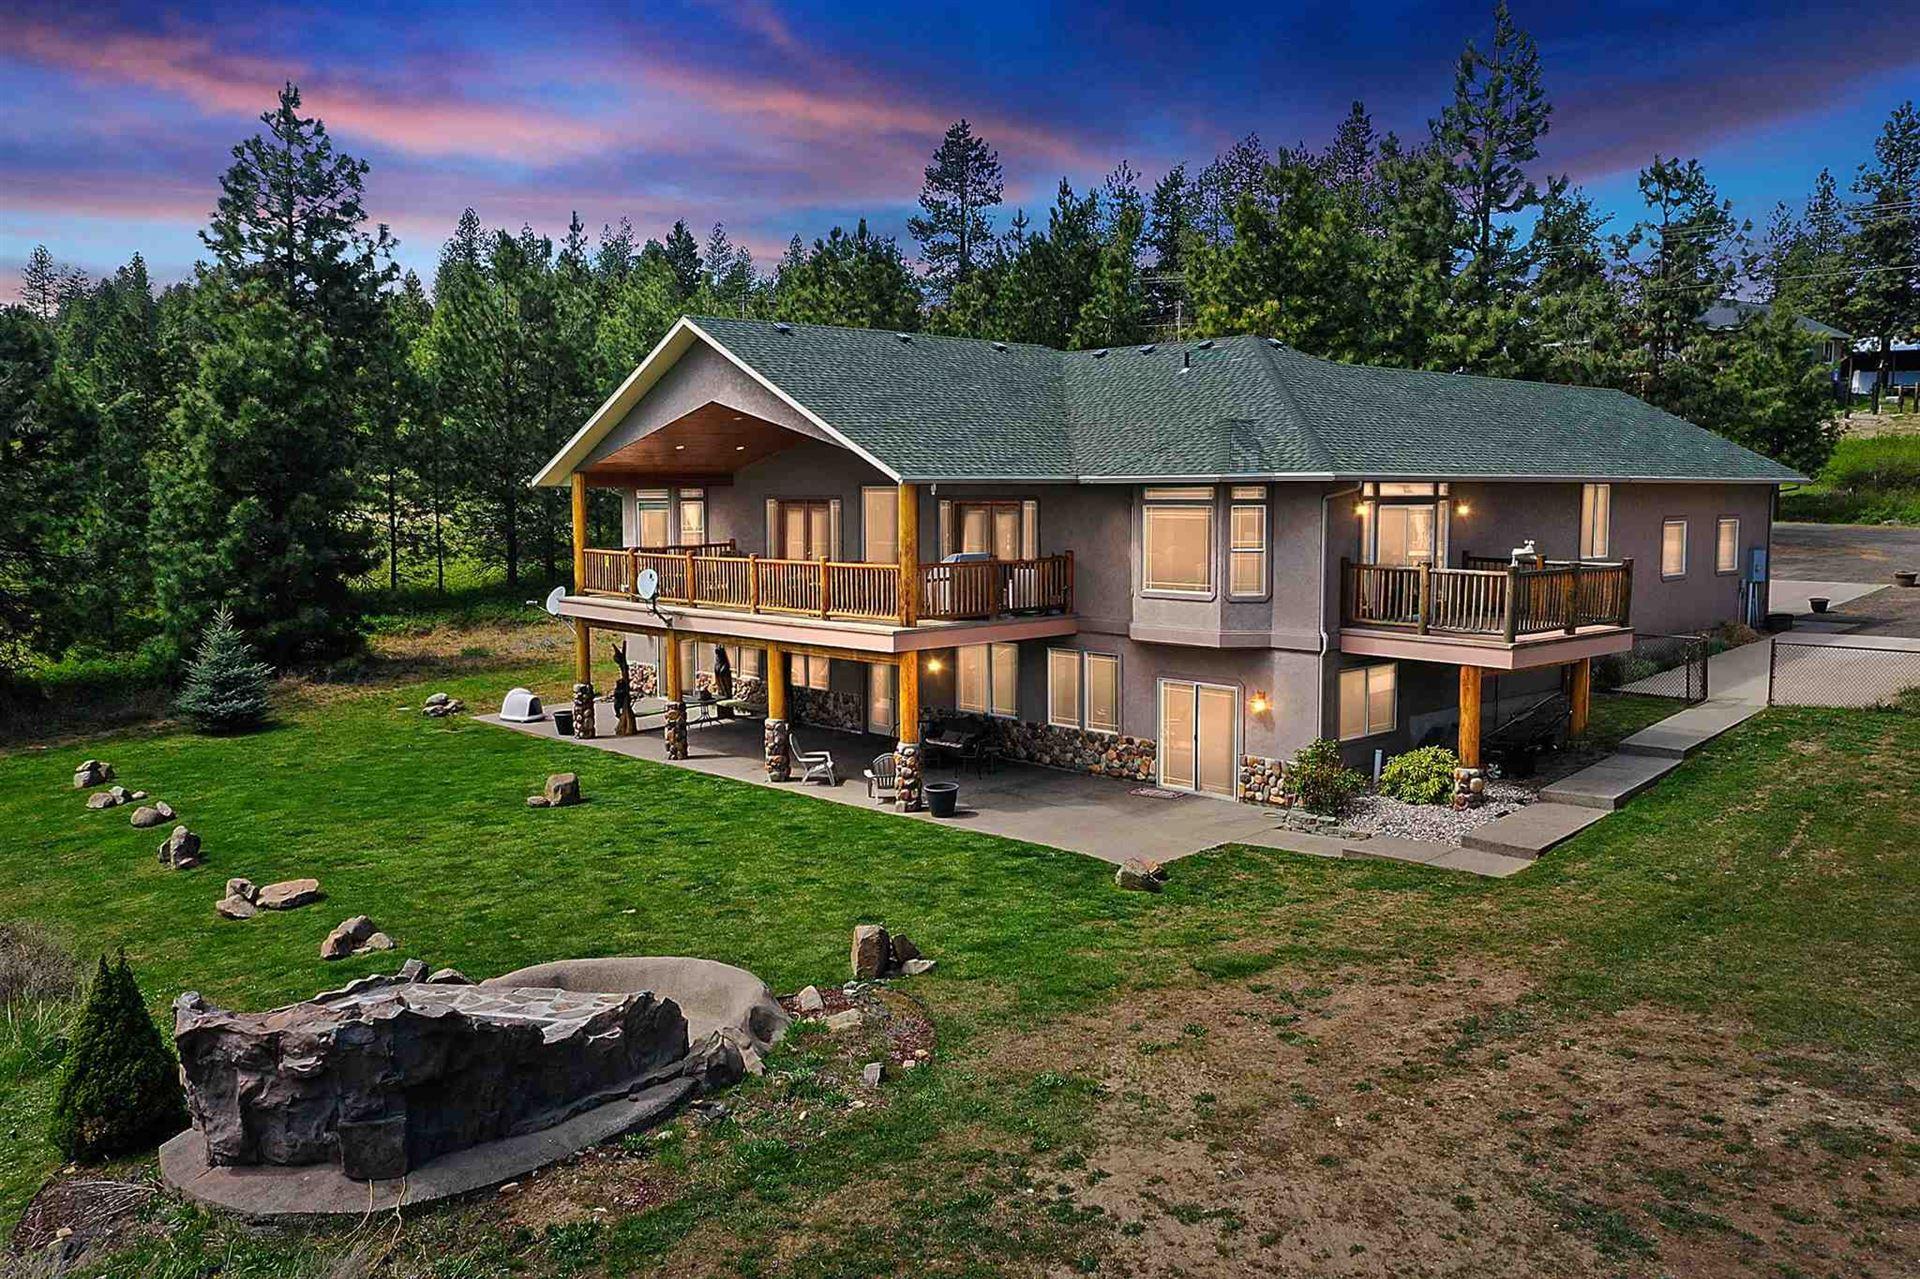 3117 W Eagles Nest Ln, Spokane, WA 99208 - #: 202114710